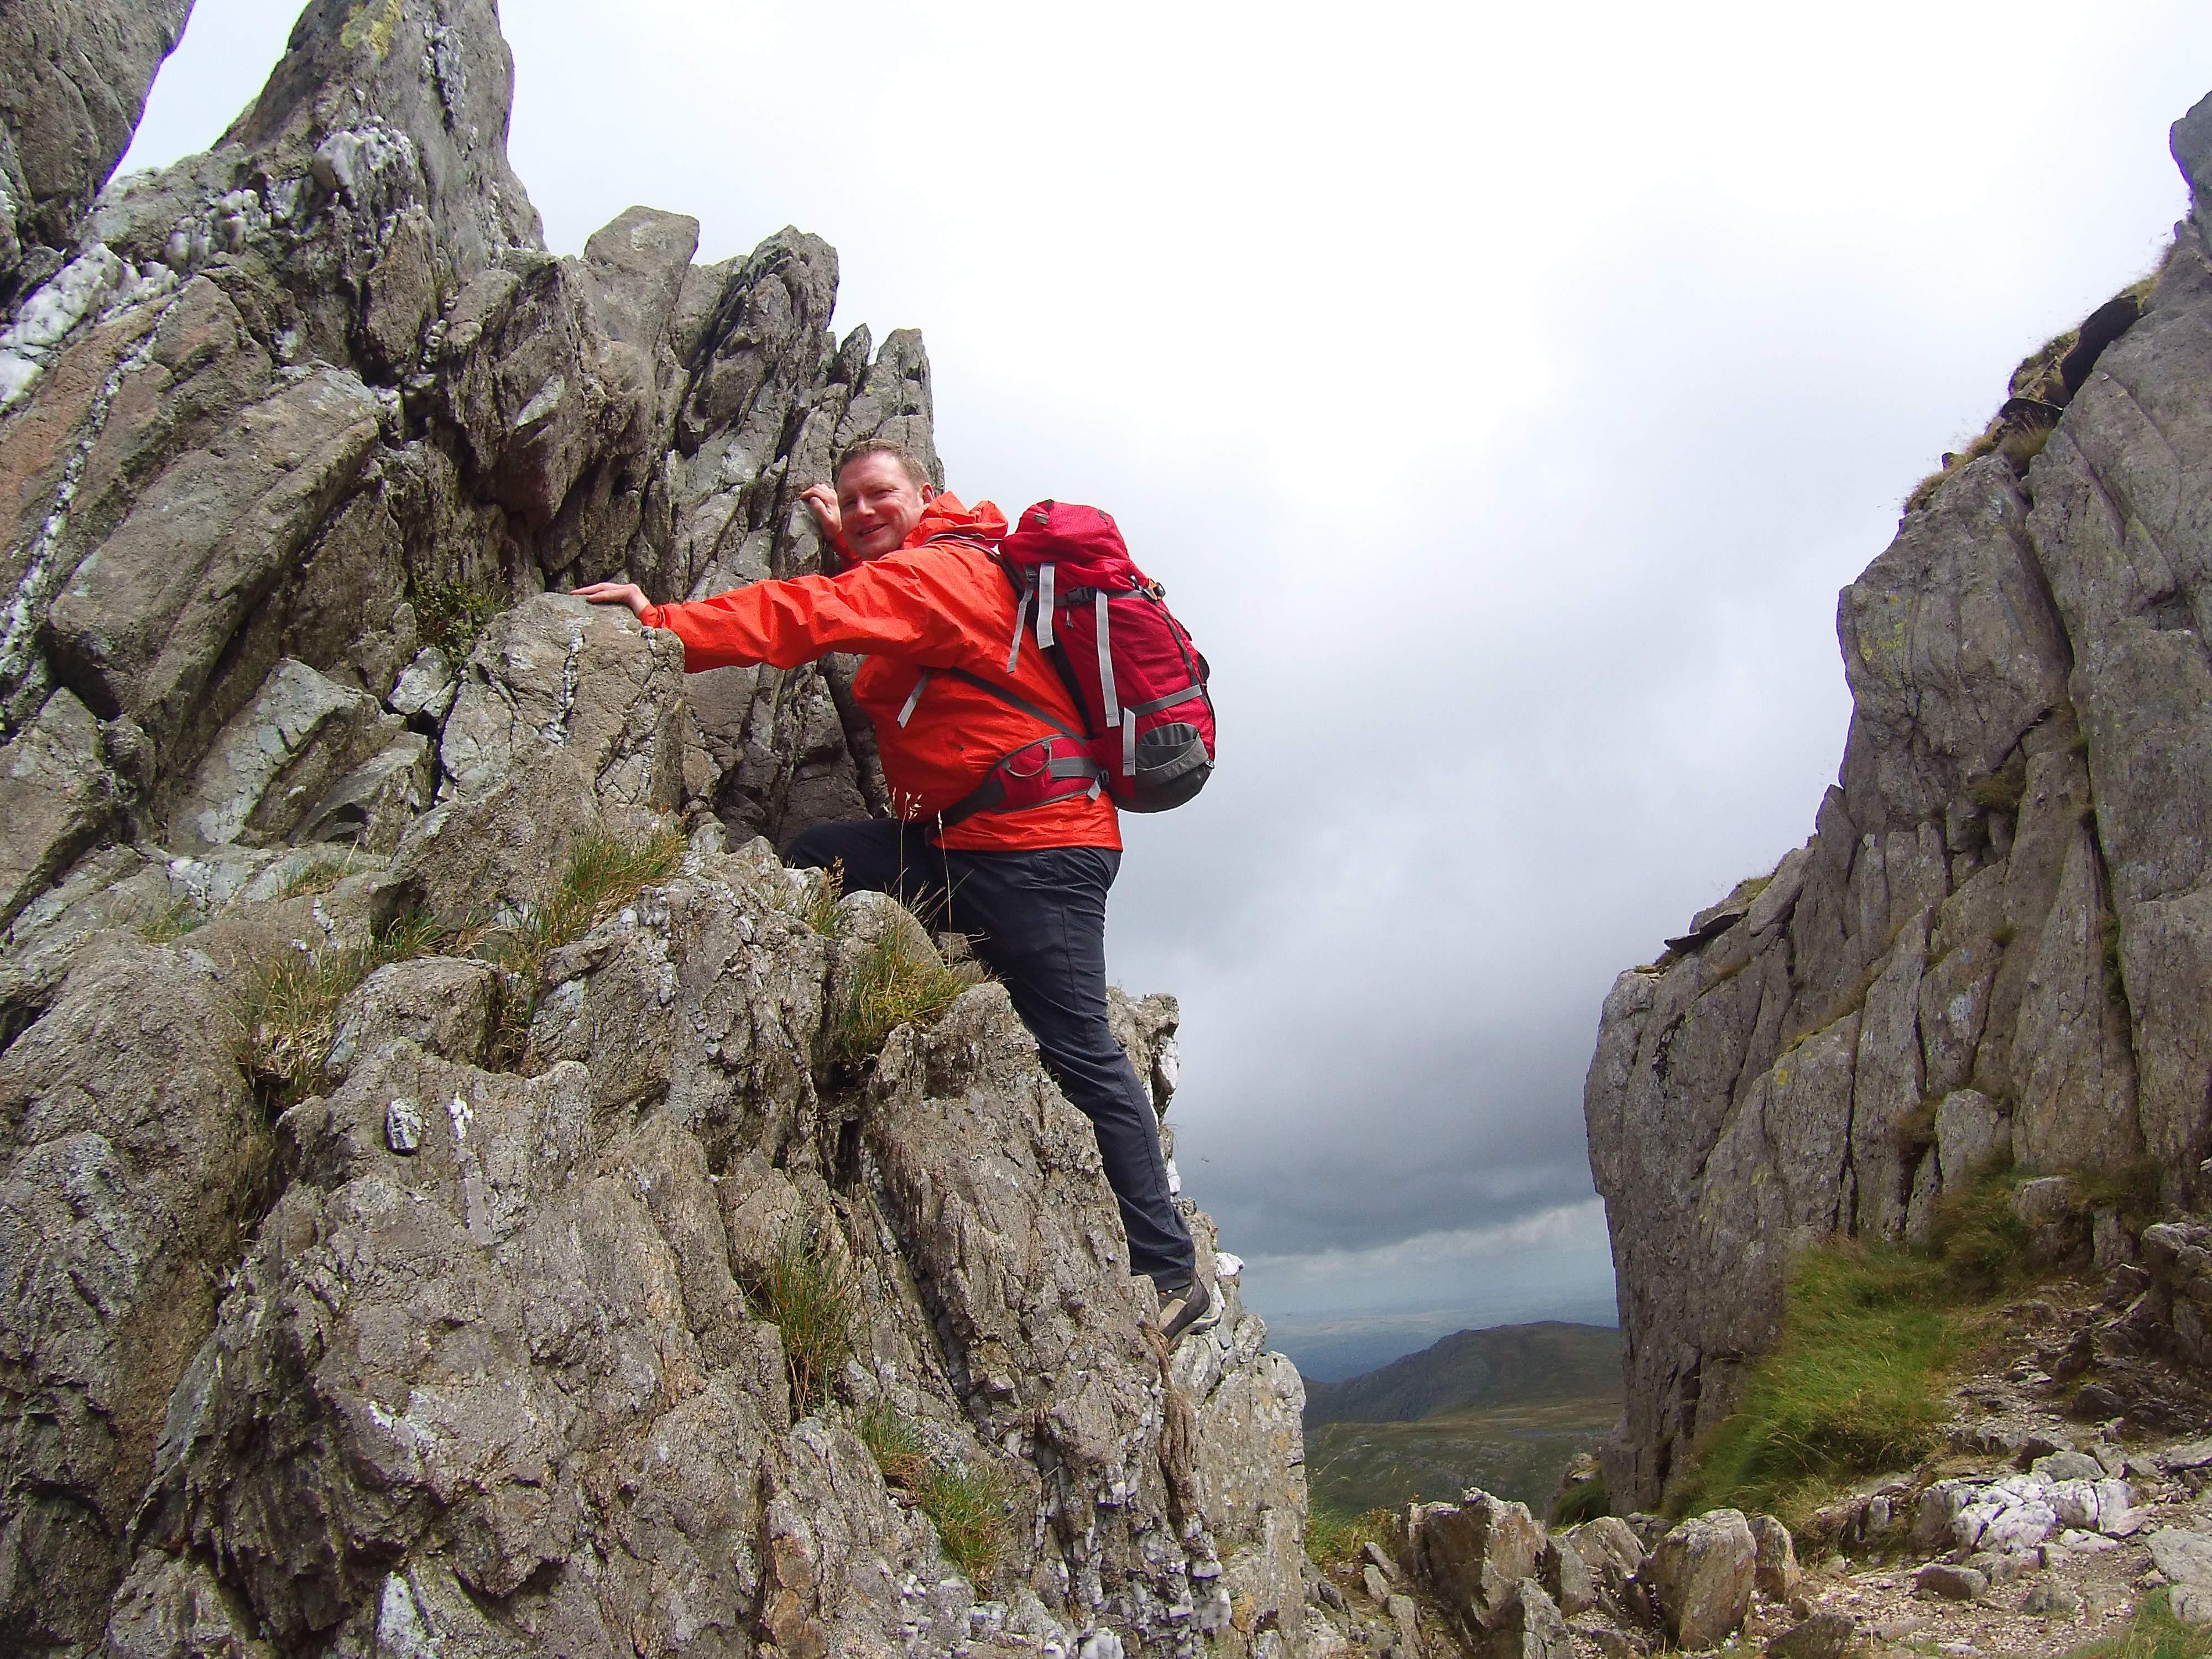 Snowdonia Walking and guiding